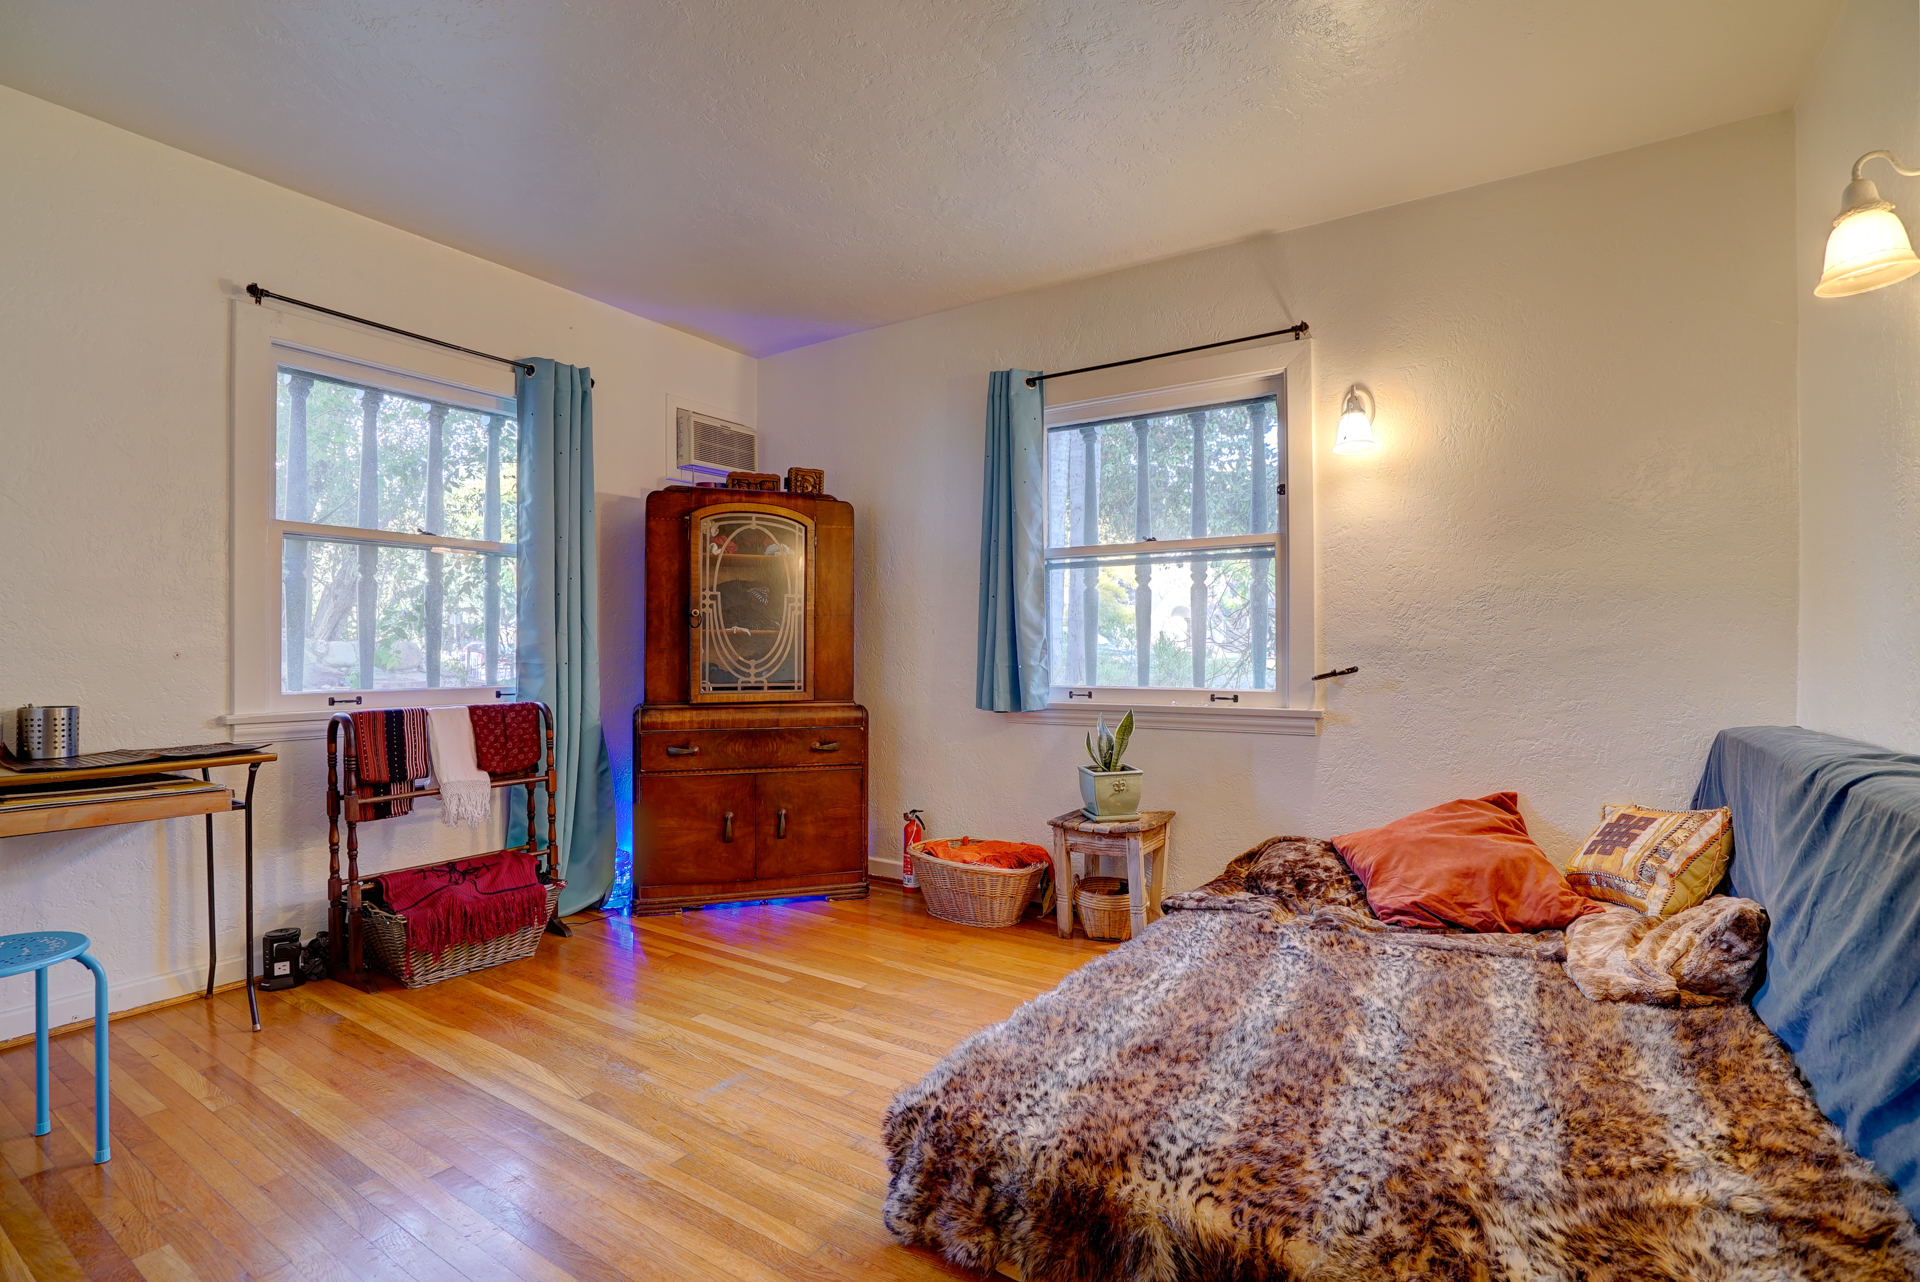 Downstairs bedroom with original hardwood floors.